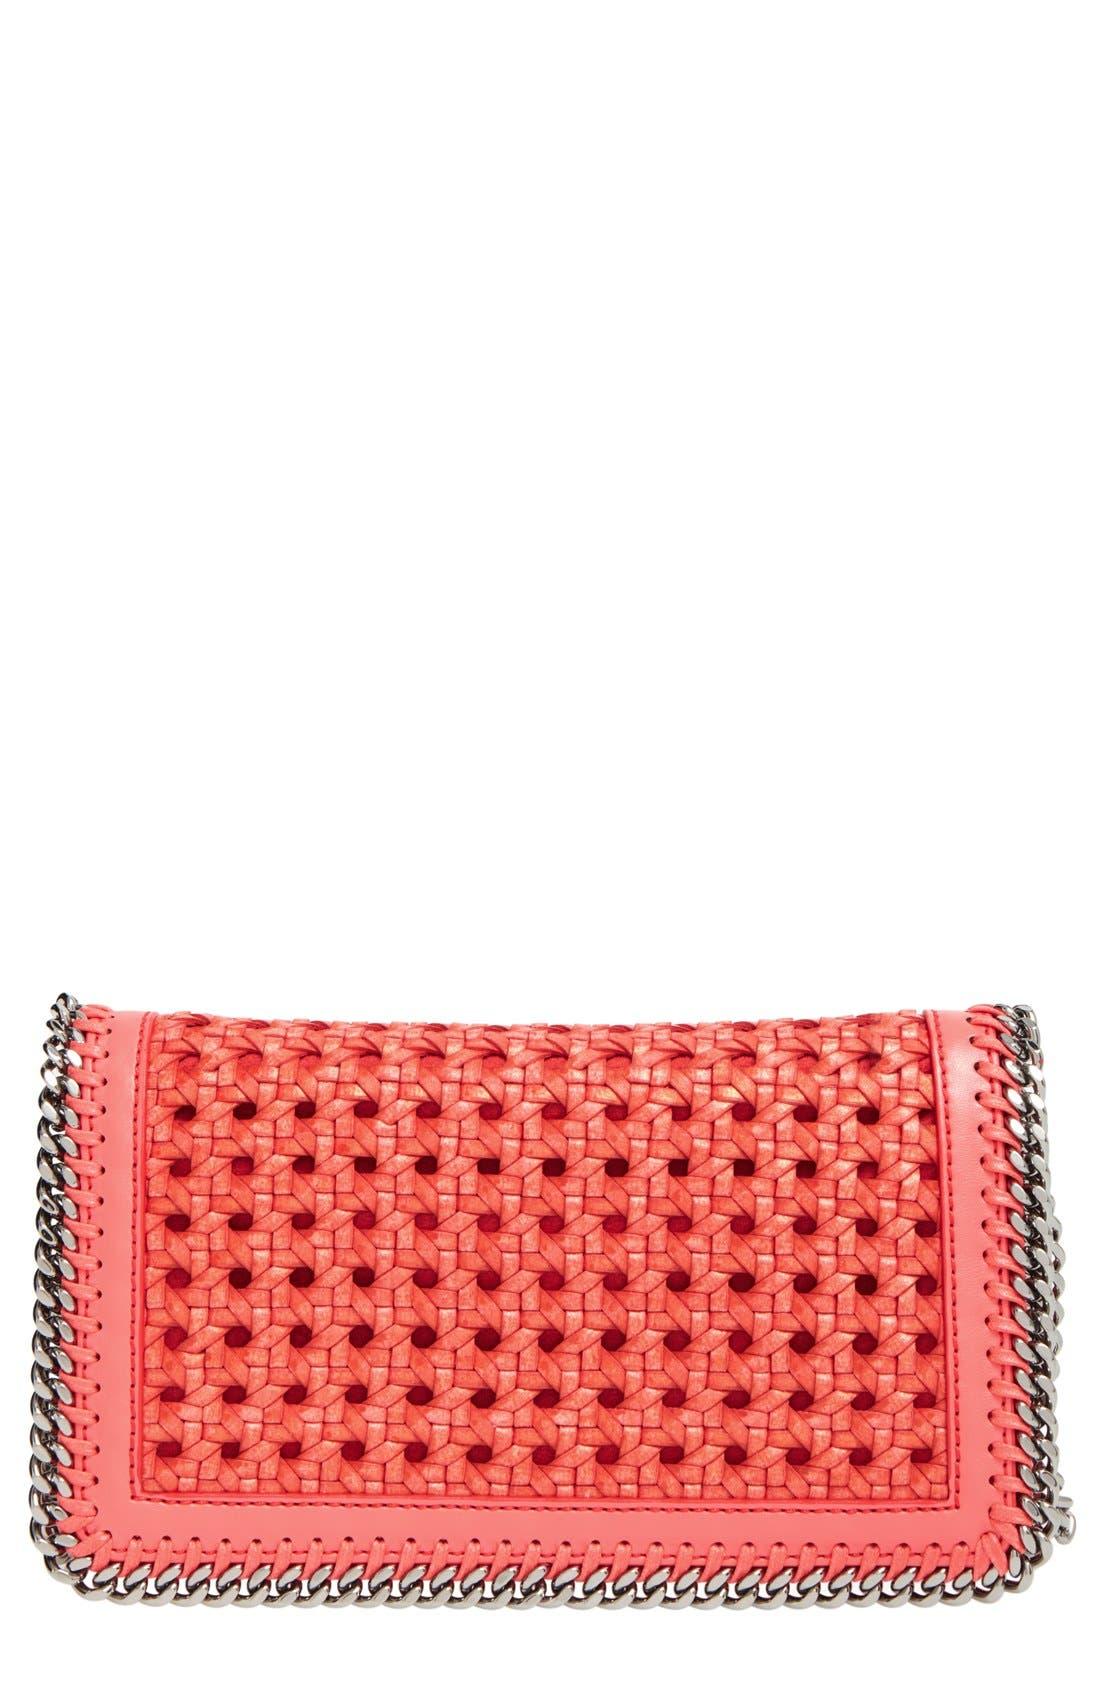 Main Image - Stella McCartney 'Falabella - Caned' Faux Leather Crossbody Bag